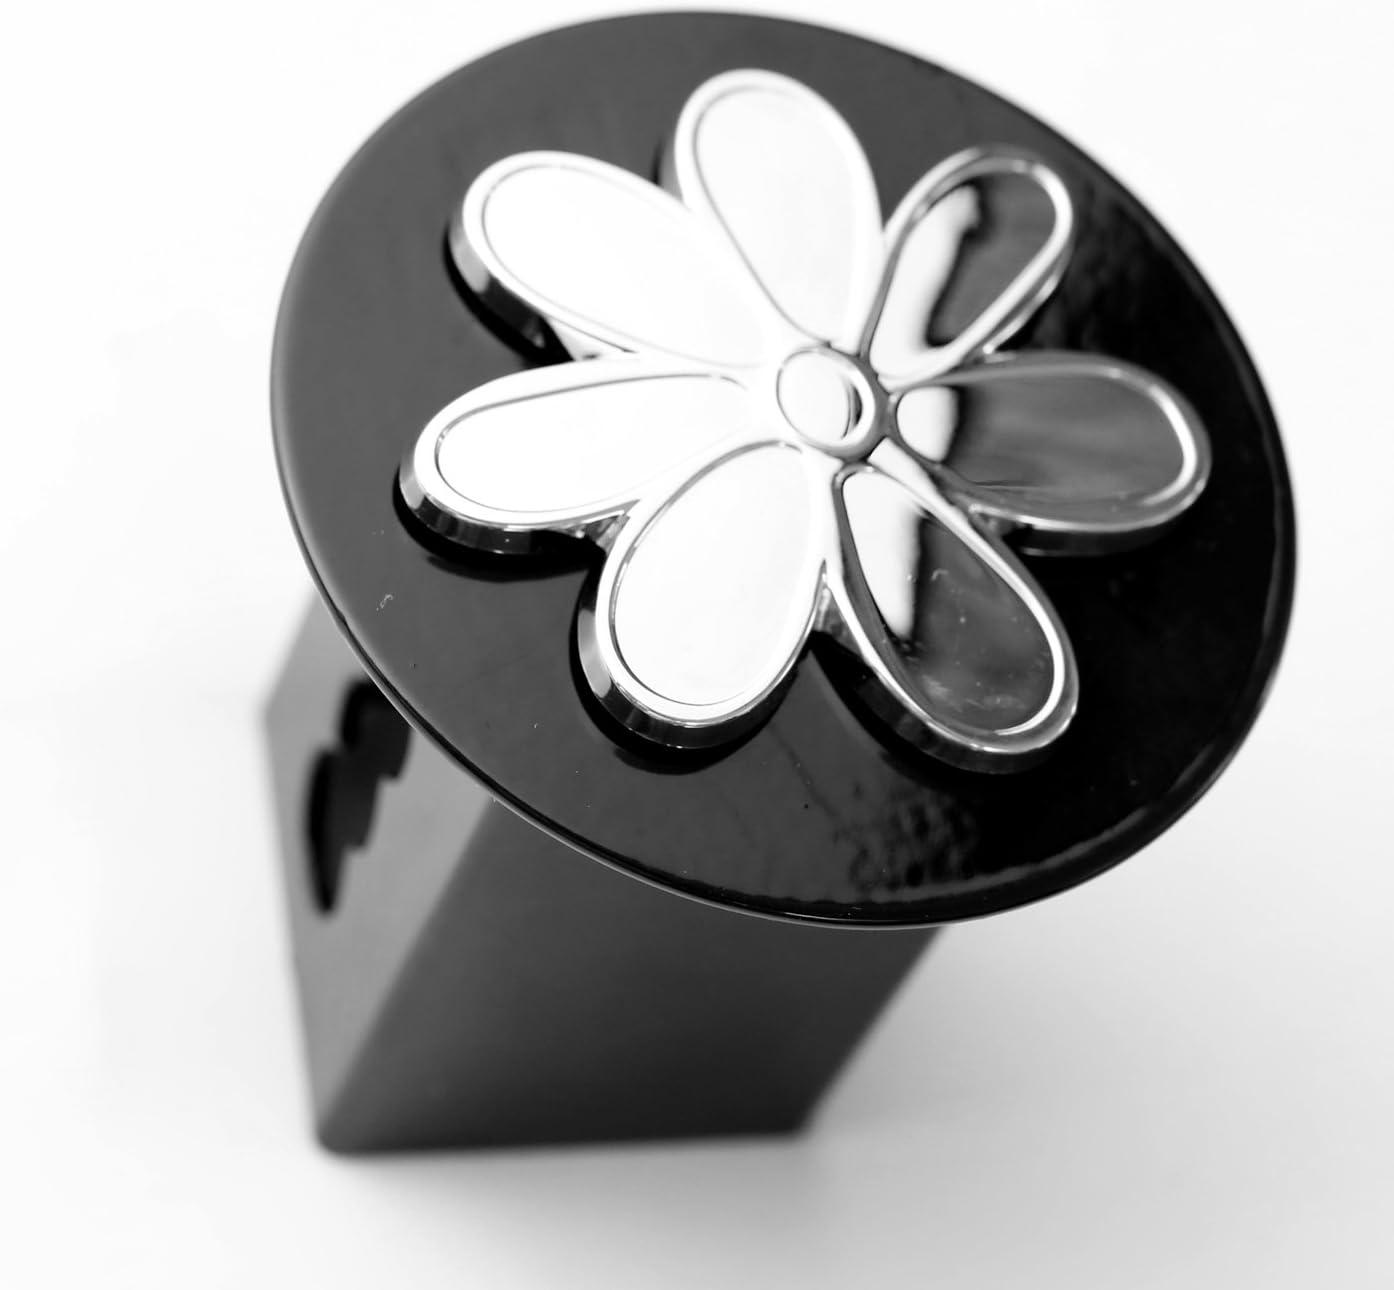 LFPartS Plumeria Flower 3D Emblem Metal Trailer Hitch Cover Fits 2 Receivers